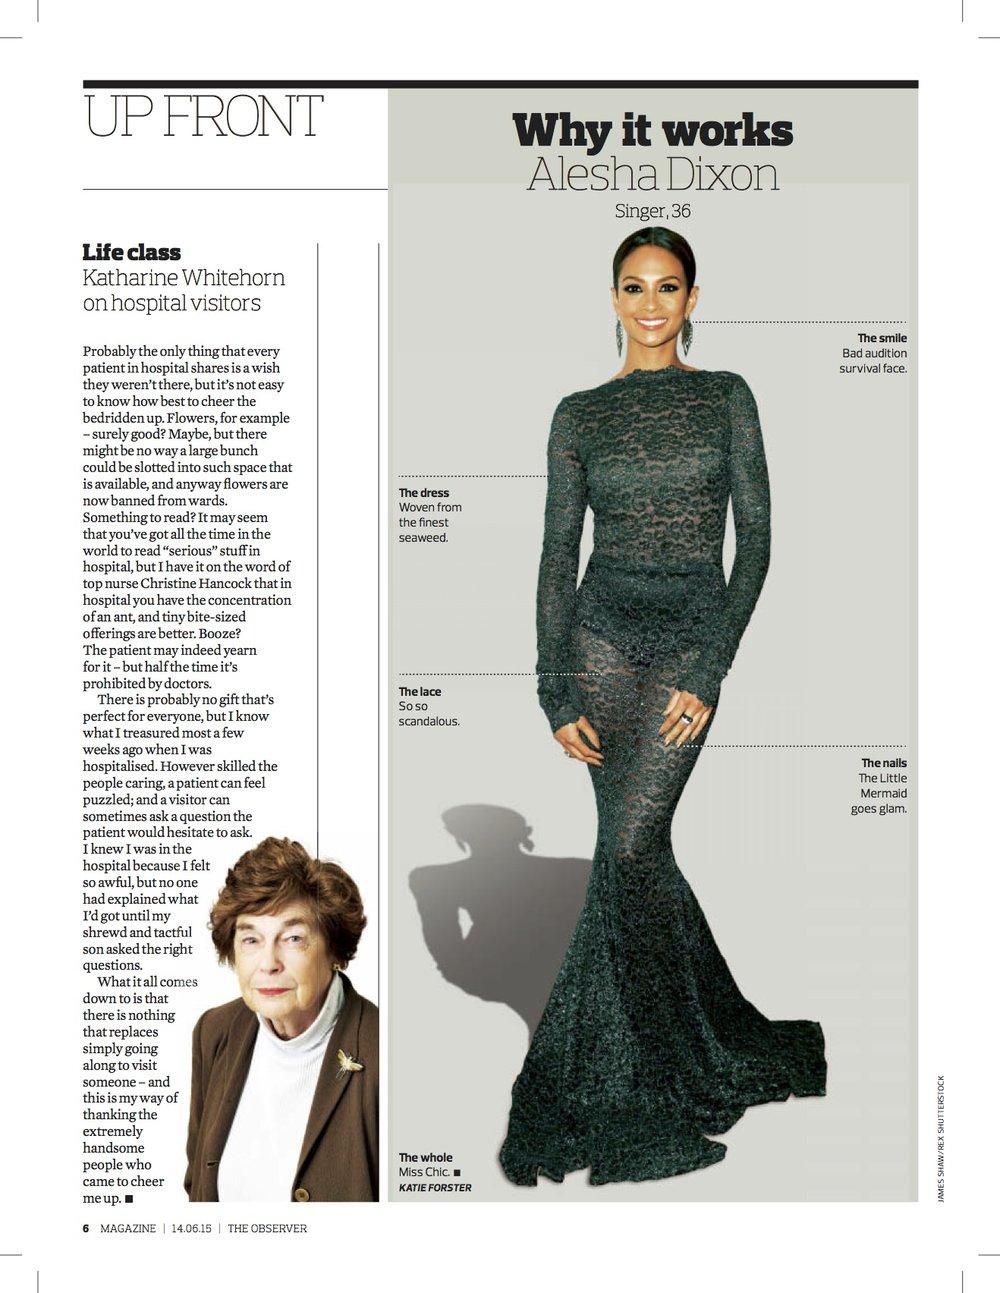 Alesha Dixon Observer Magazine.jpg